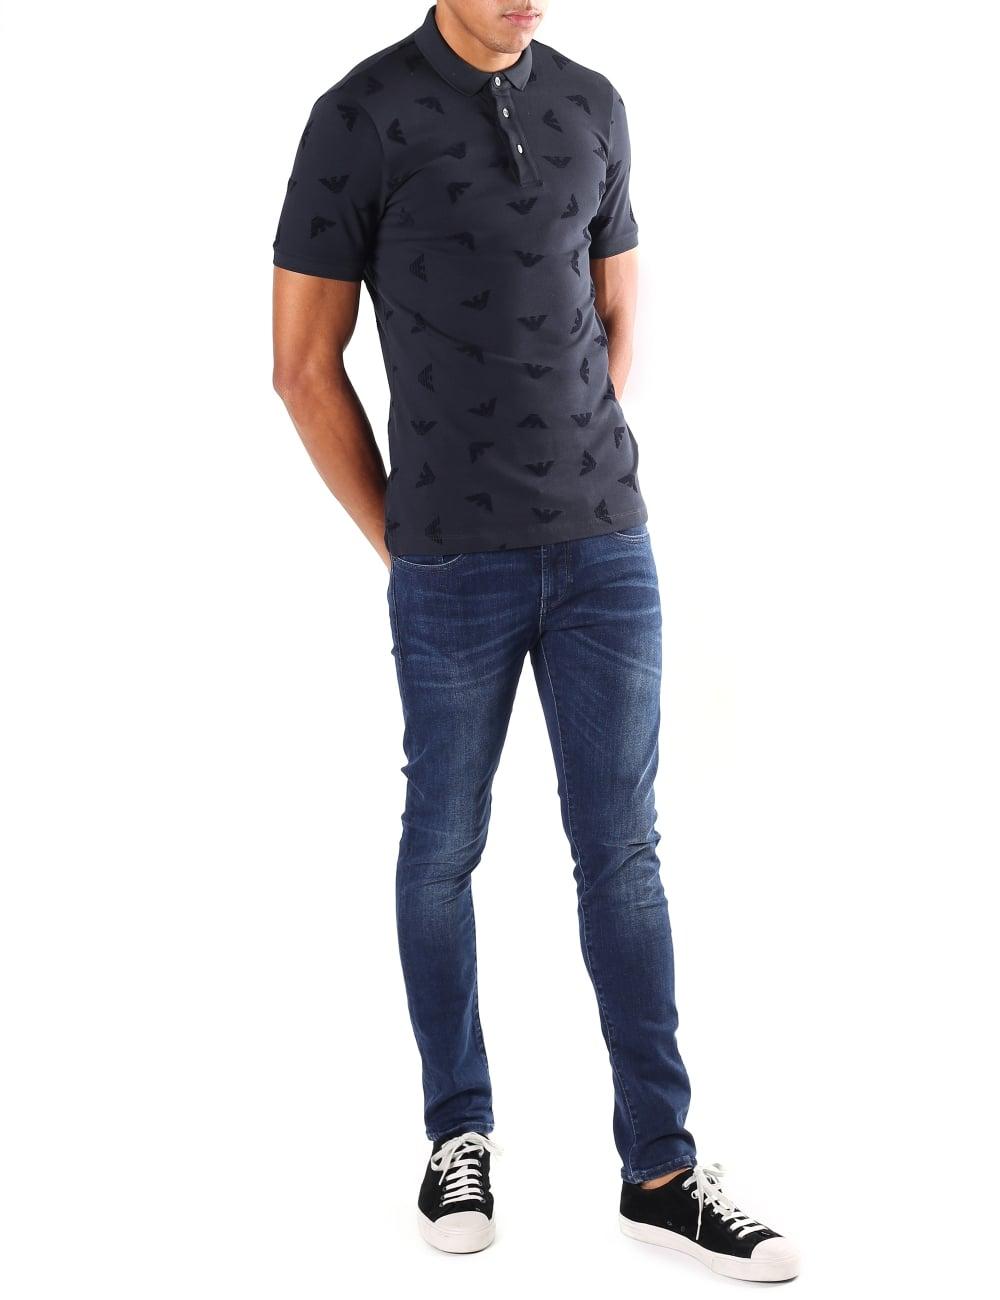 Armani Jeans Polo Top